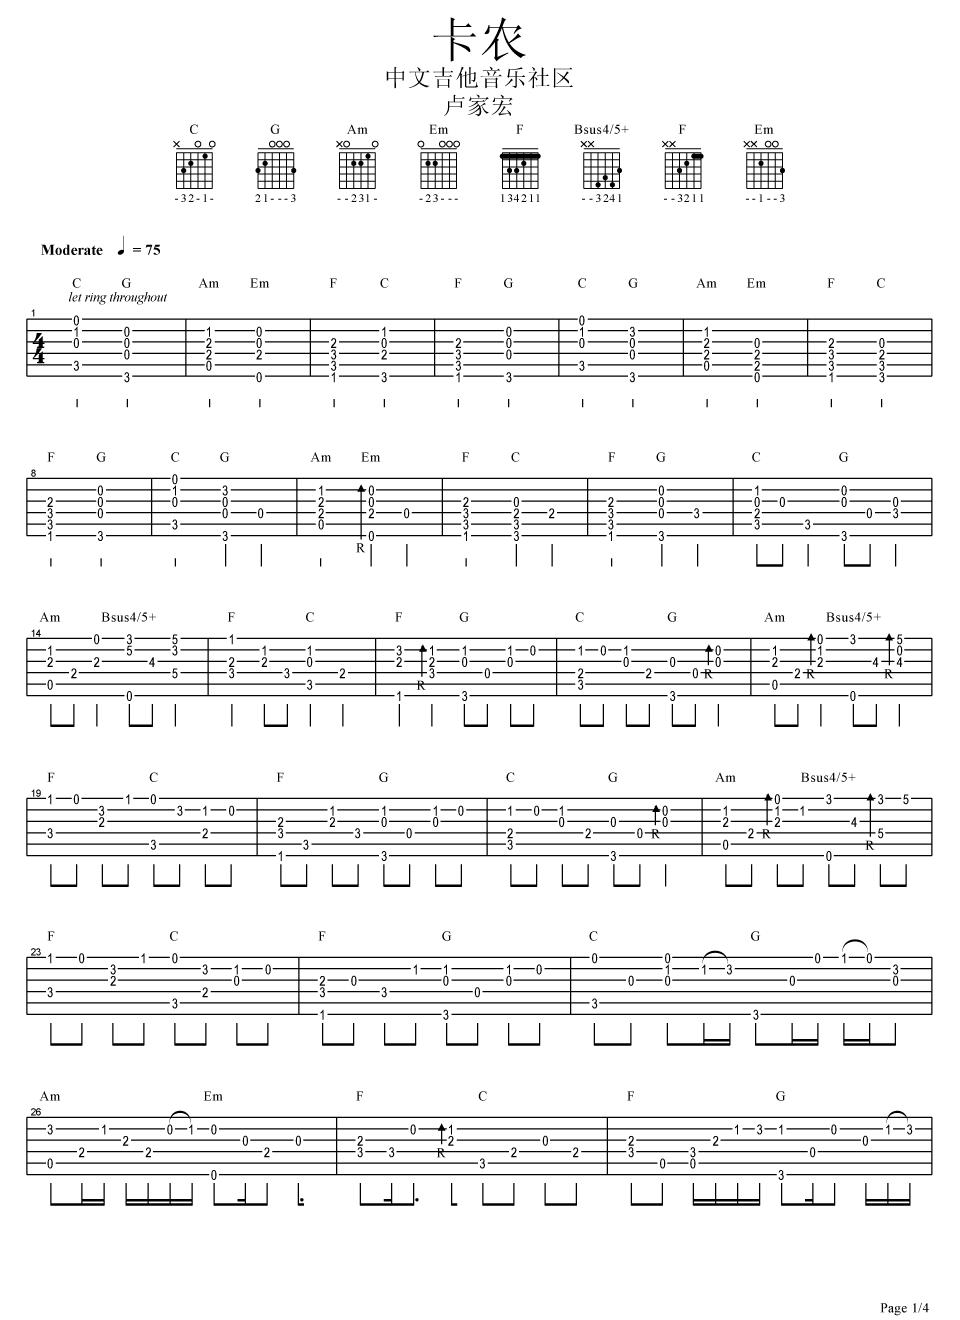 ��C��[�2_求卢家宏《卡农》c调木吉他谱要卢家宏c调卡农吉他谱.